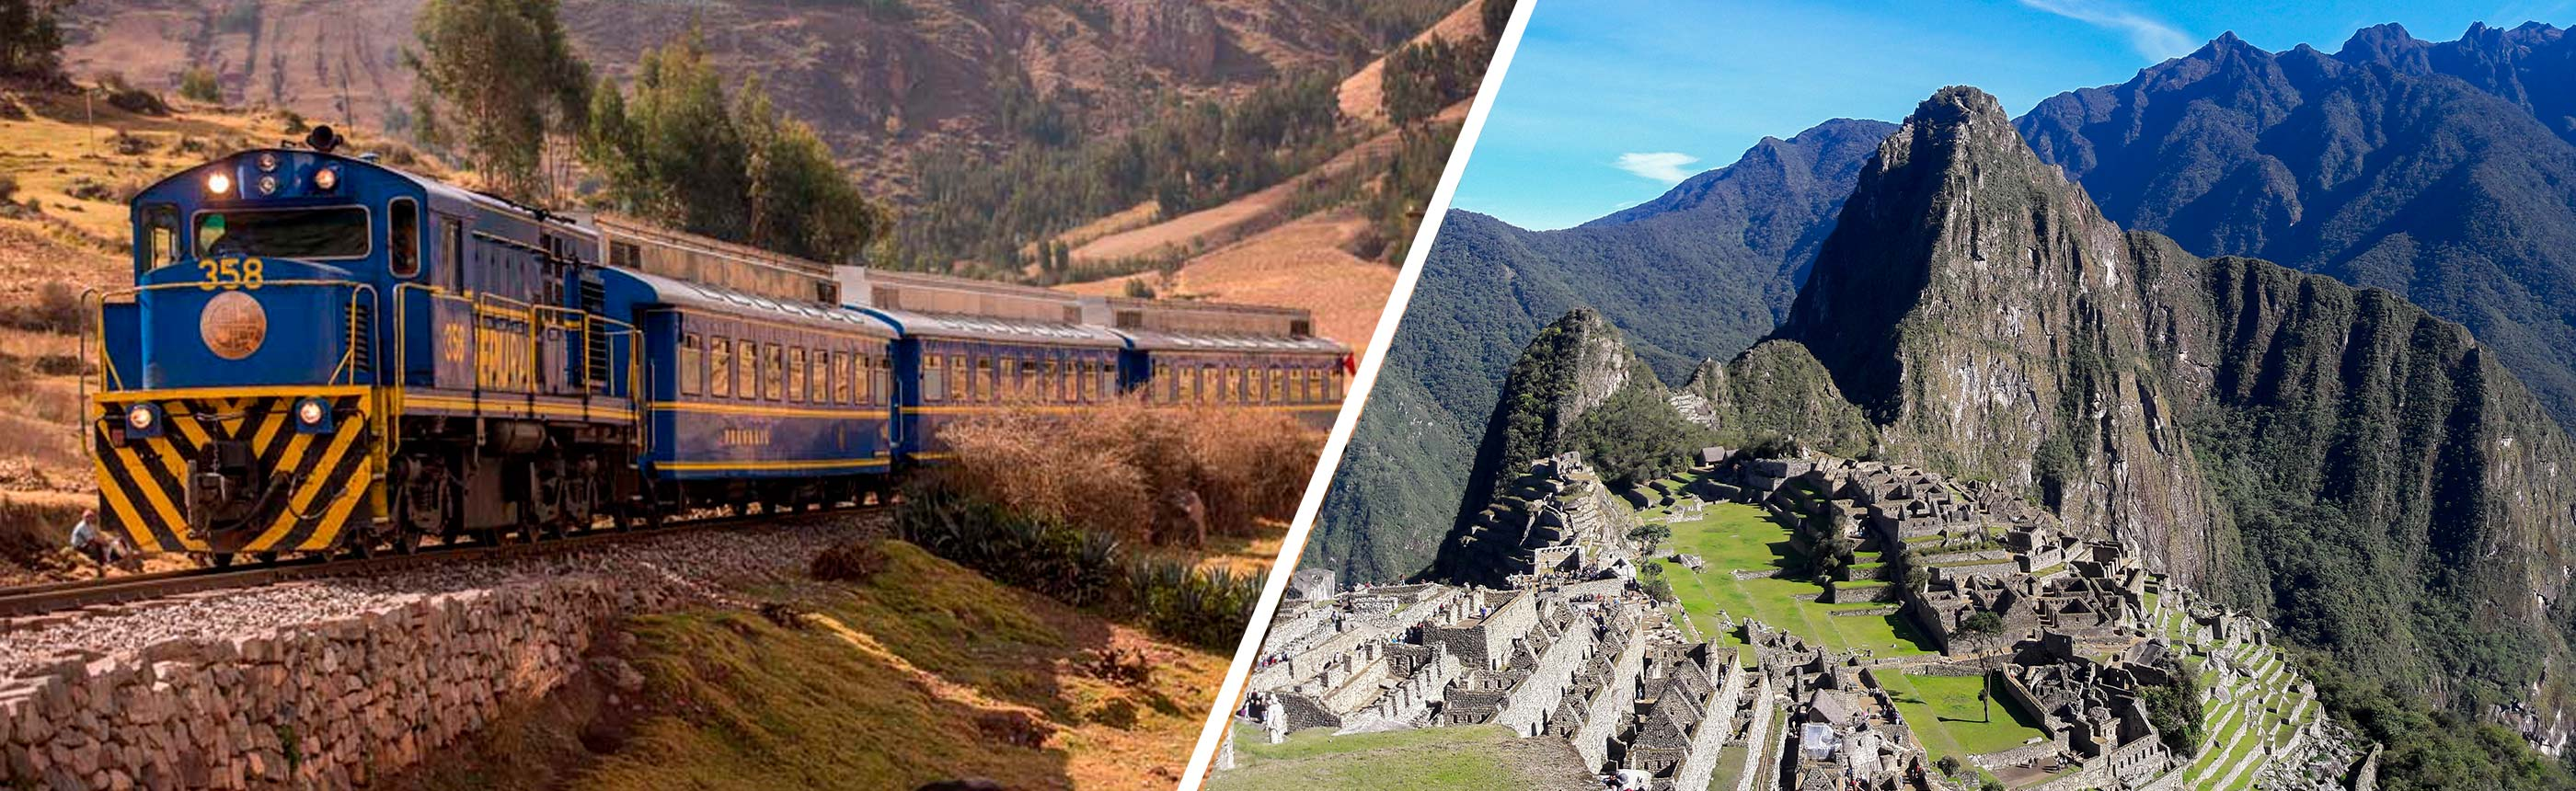 Lares Trek to Machu Picchu (The Ultimate Cultural Trek)